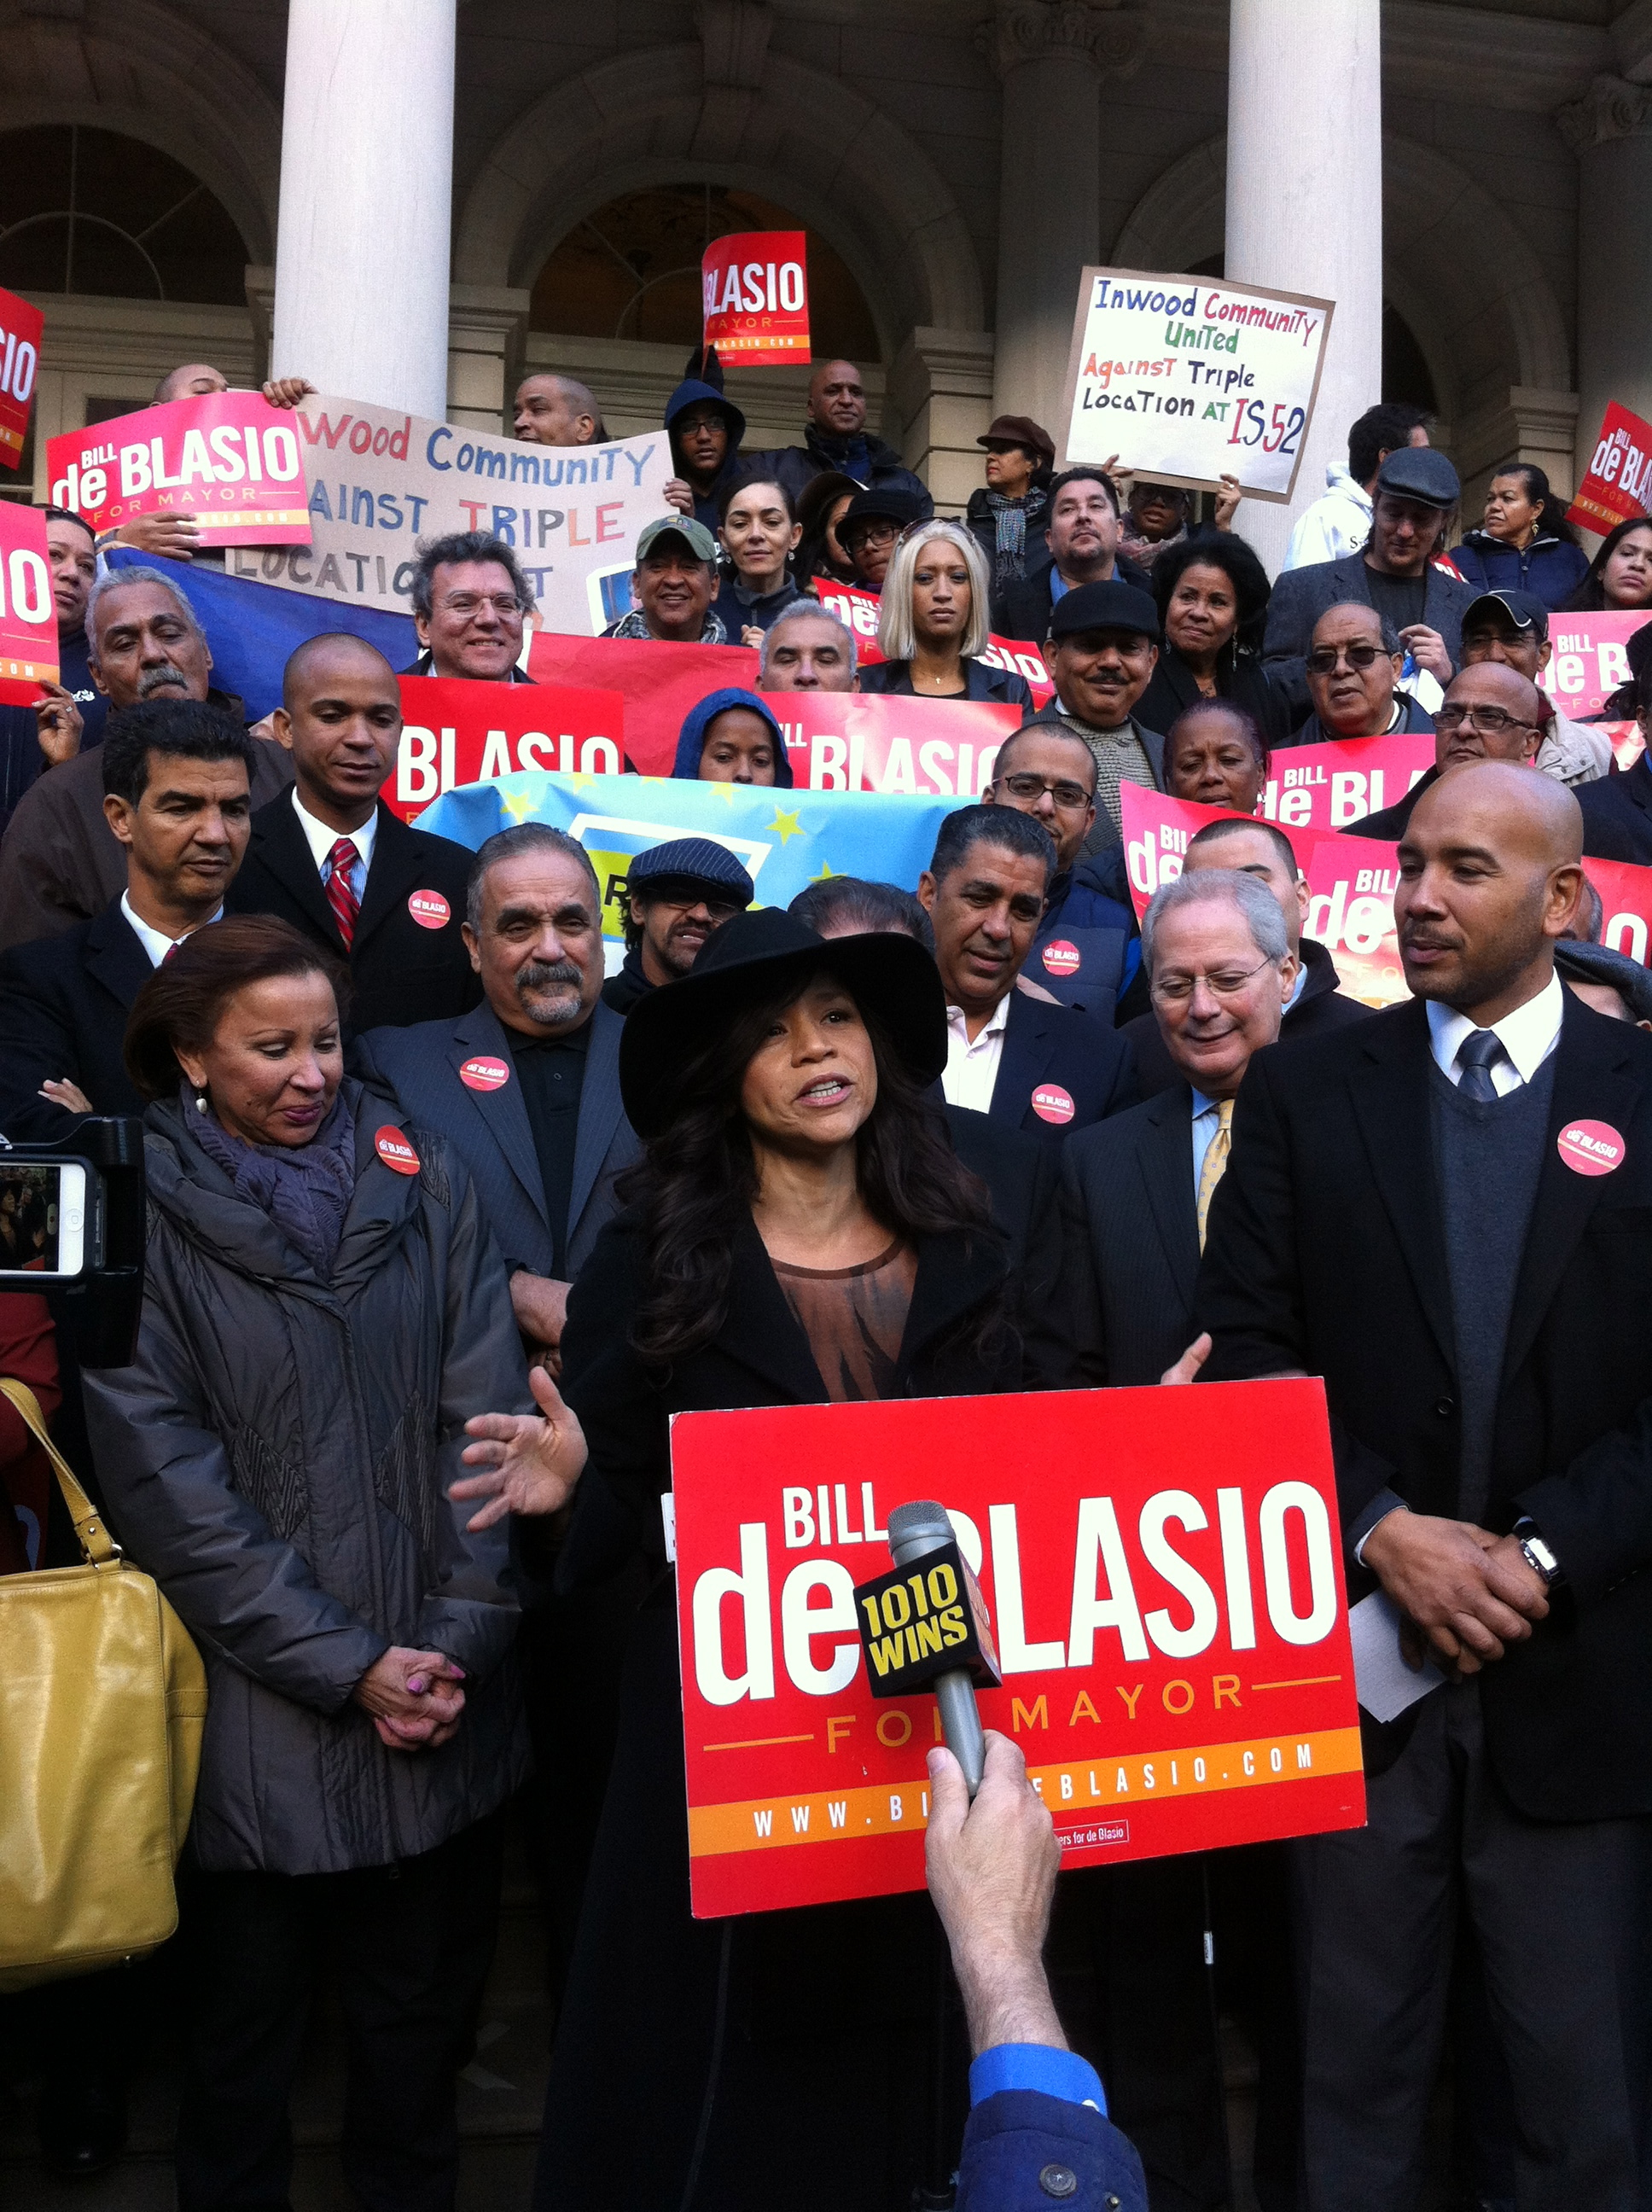 Rosie Perez at Bill De Blasio Rally, City Hall